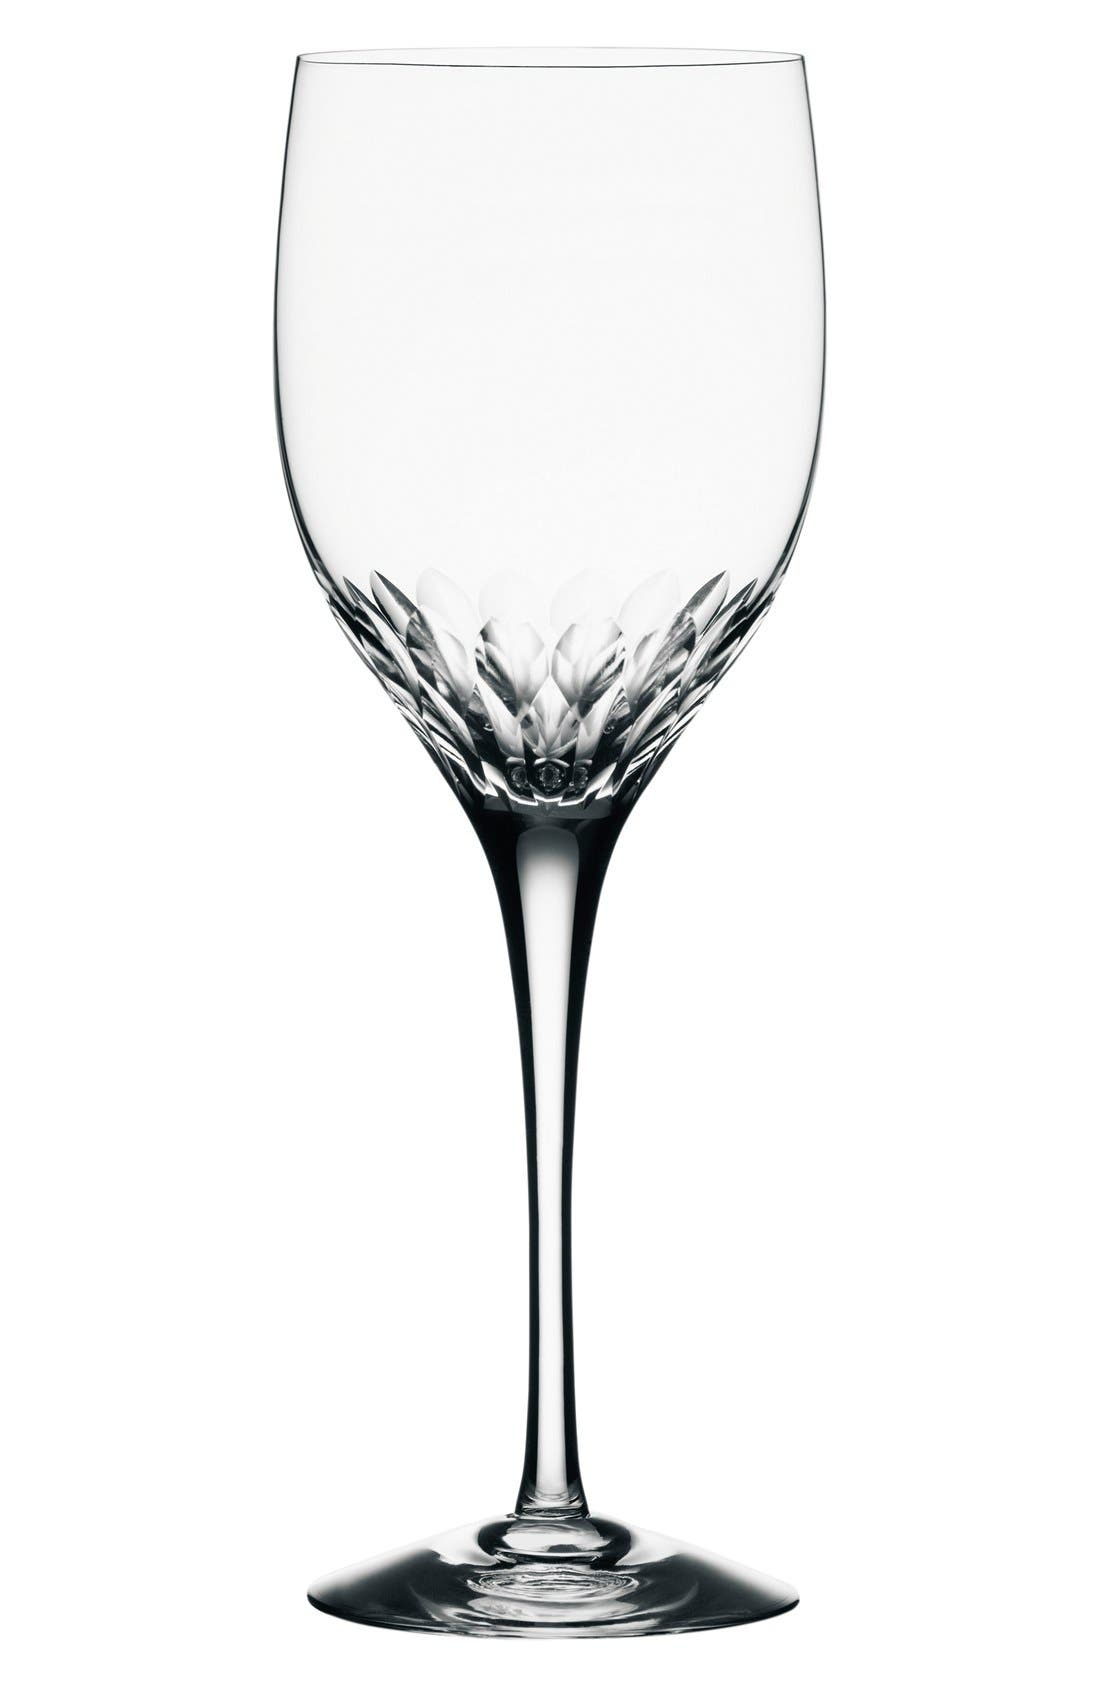 Alternate Image 1 Selected - Orrefors'Prelude' Iced Beverage Glass